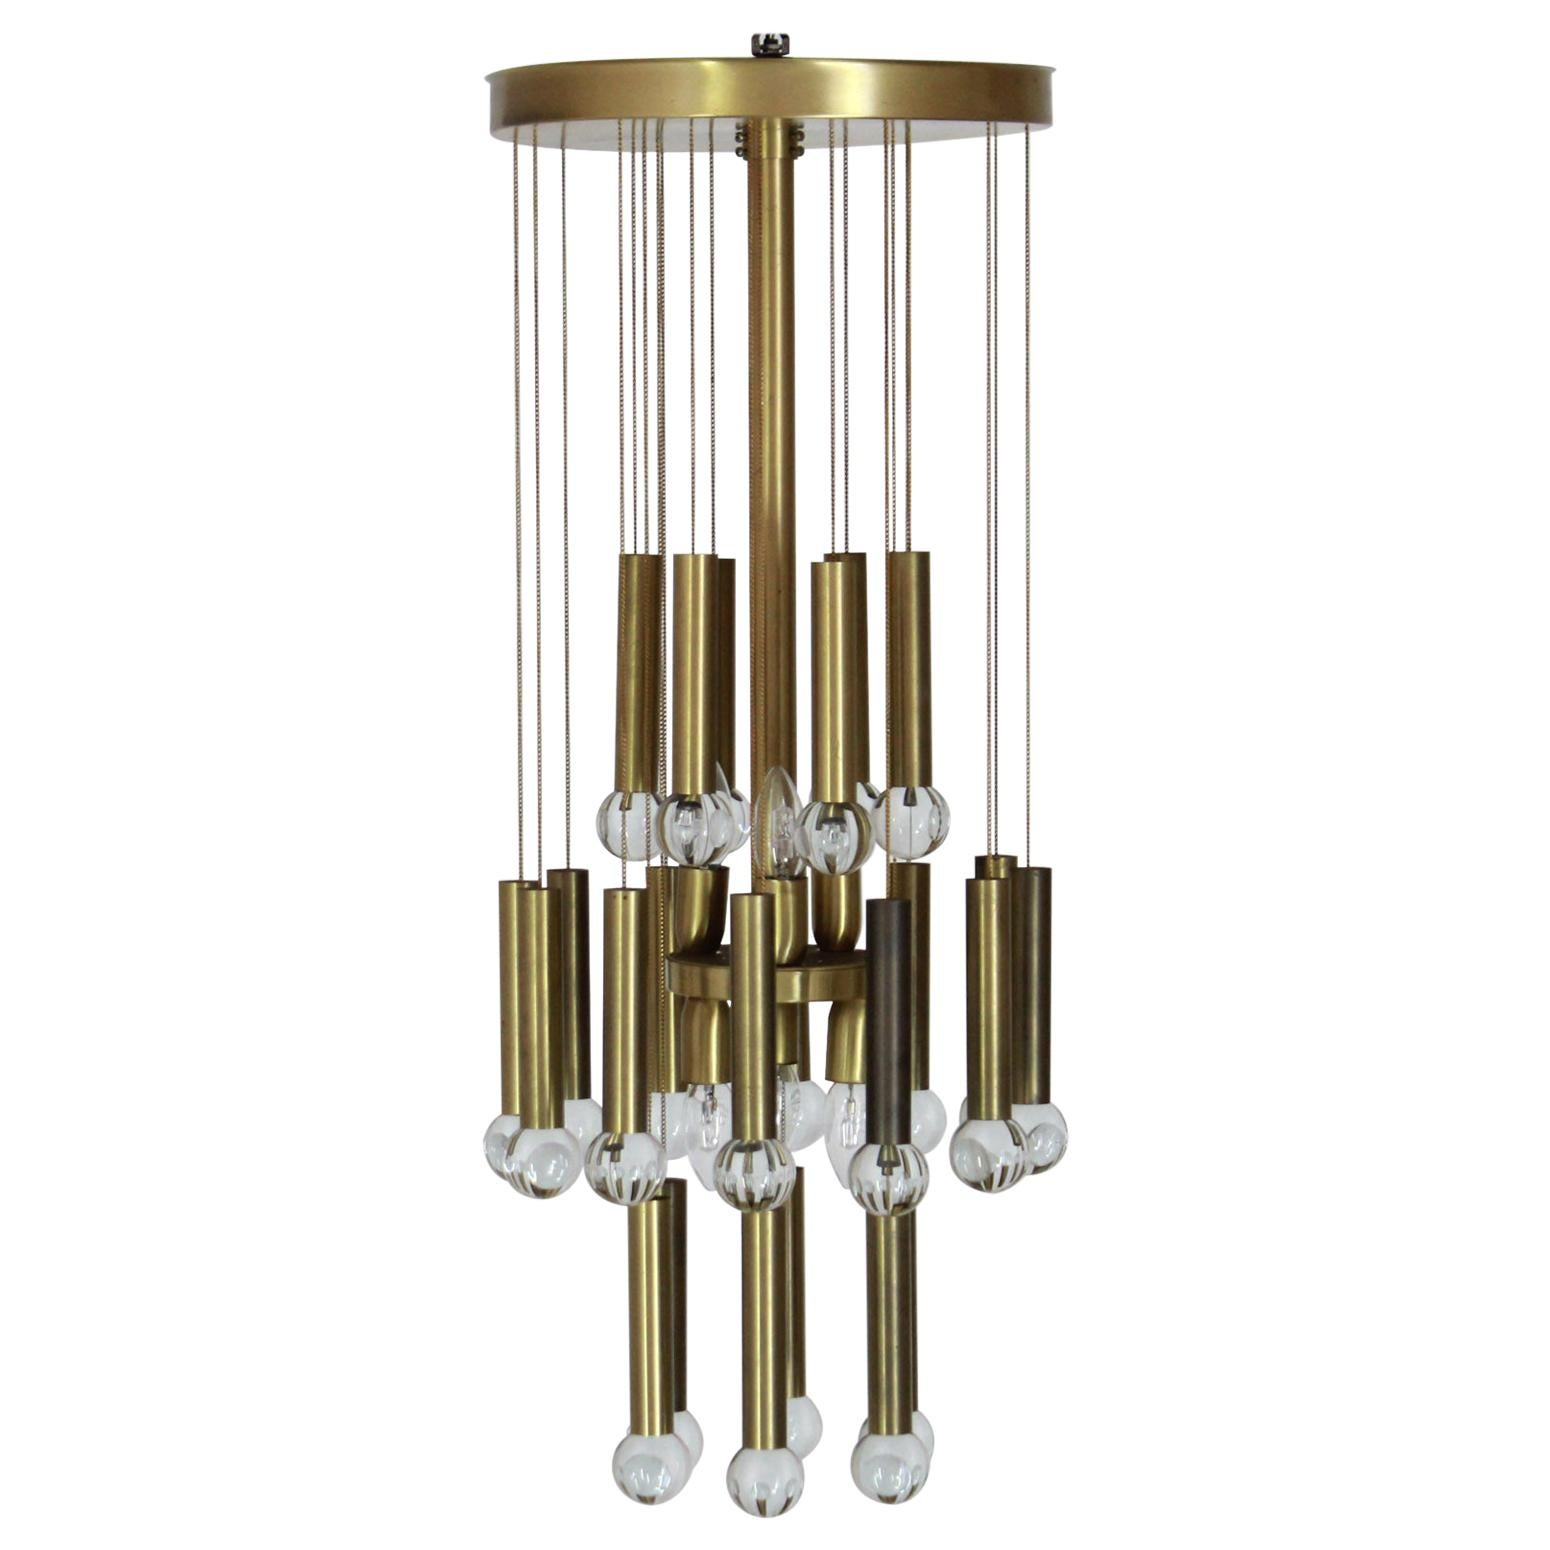 1970s Vintage Brass and Crystal Chandelier by Gaetano Sciolari Designer